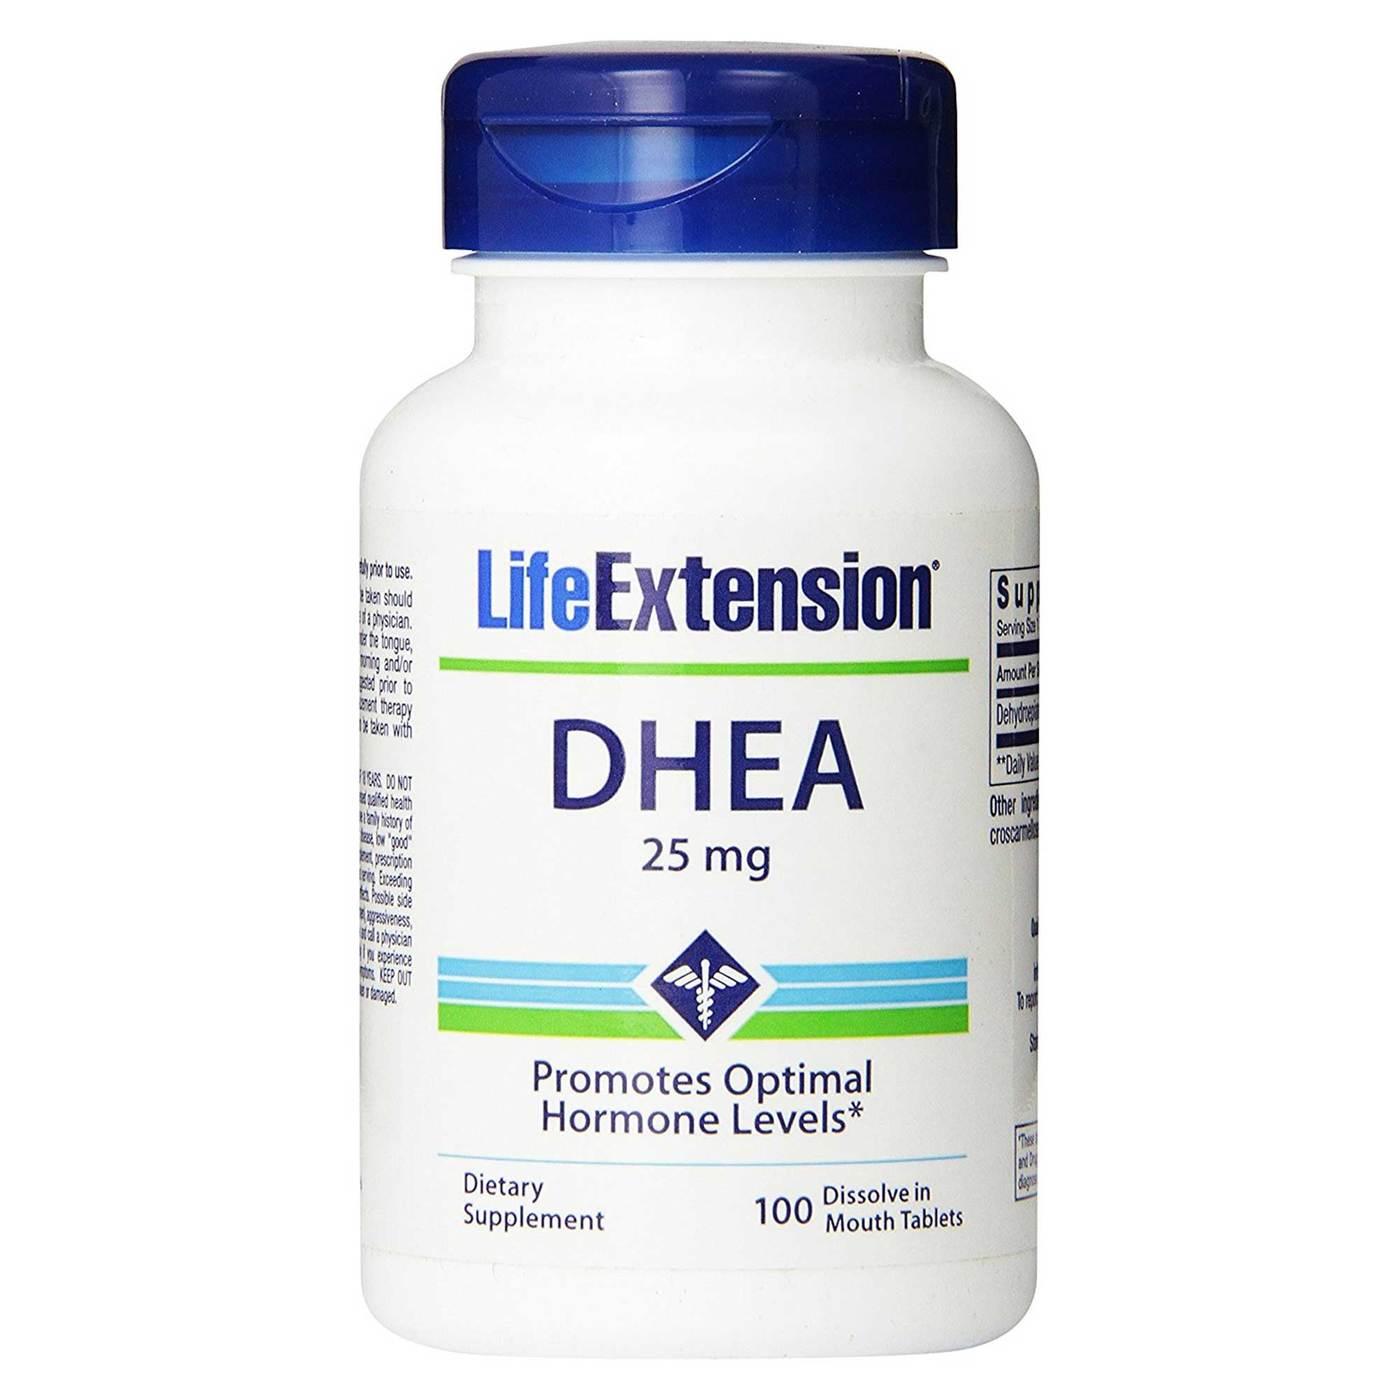 DHEA - LifeExtension